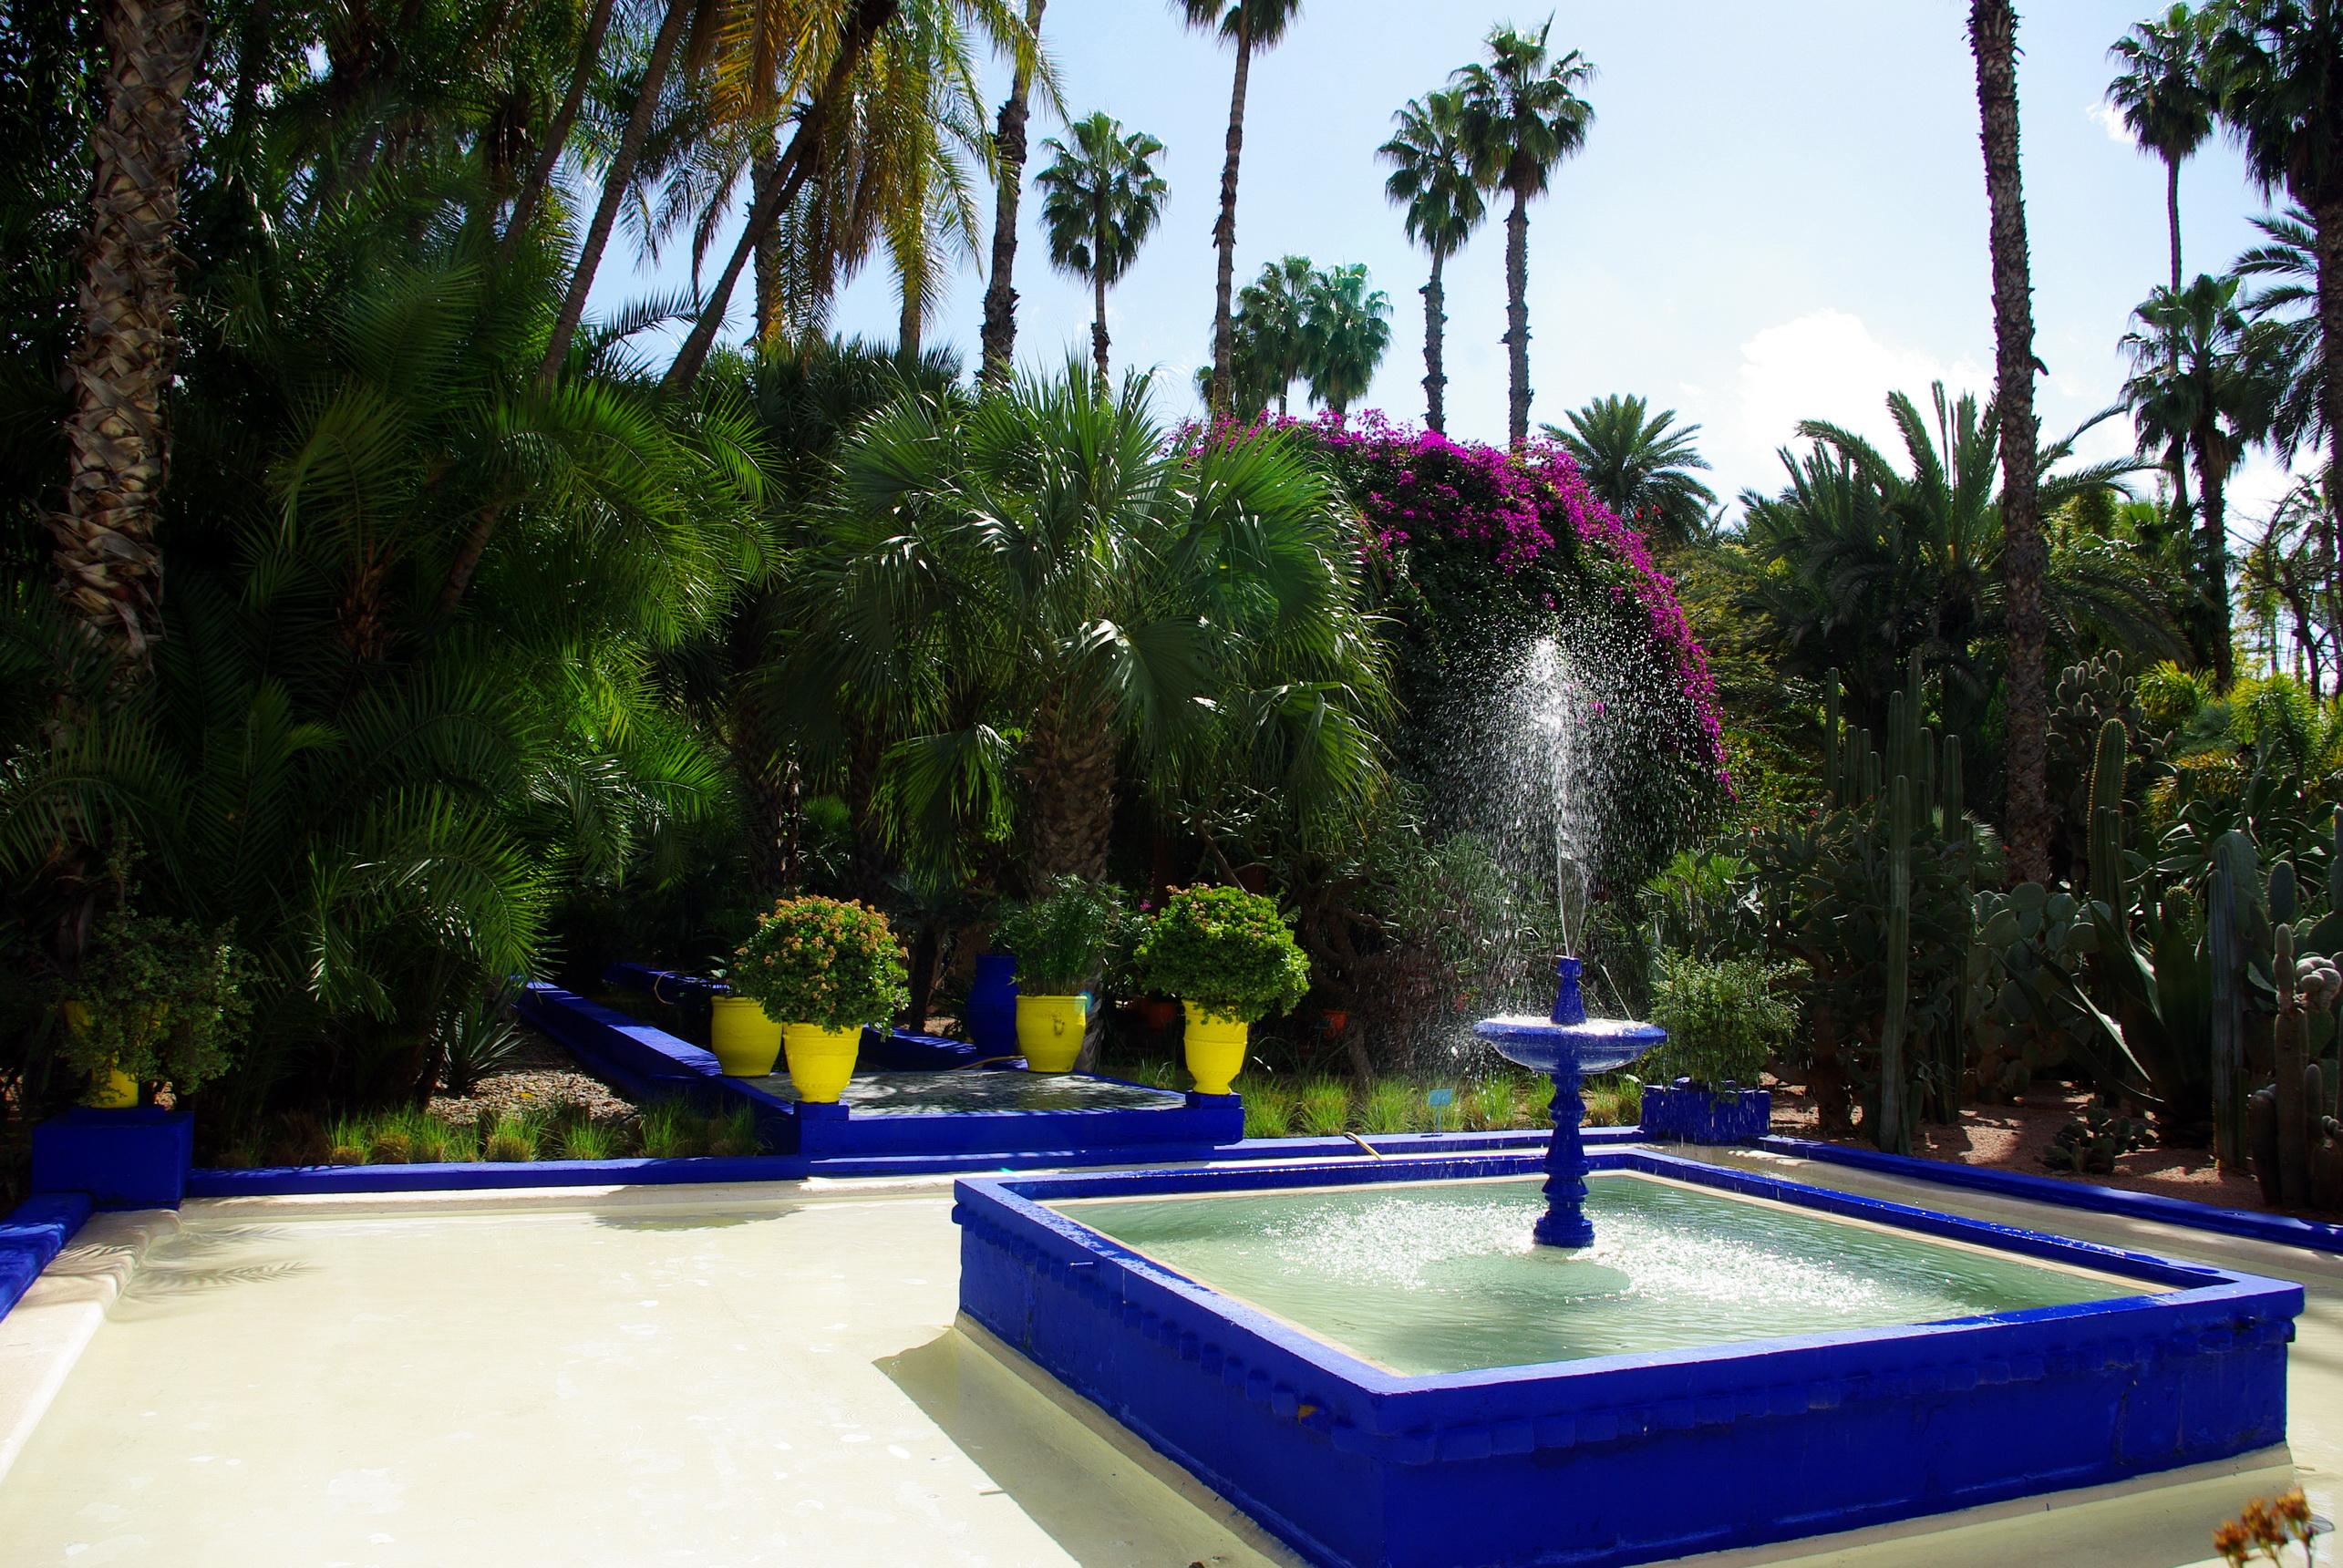 morocco marrakech jardin majorelle full hd fond d 39 cran and arri re plan 2570x1720 id 285411. Black Bedroom Furniture Sets. Home Design Ideas